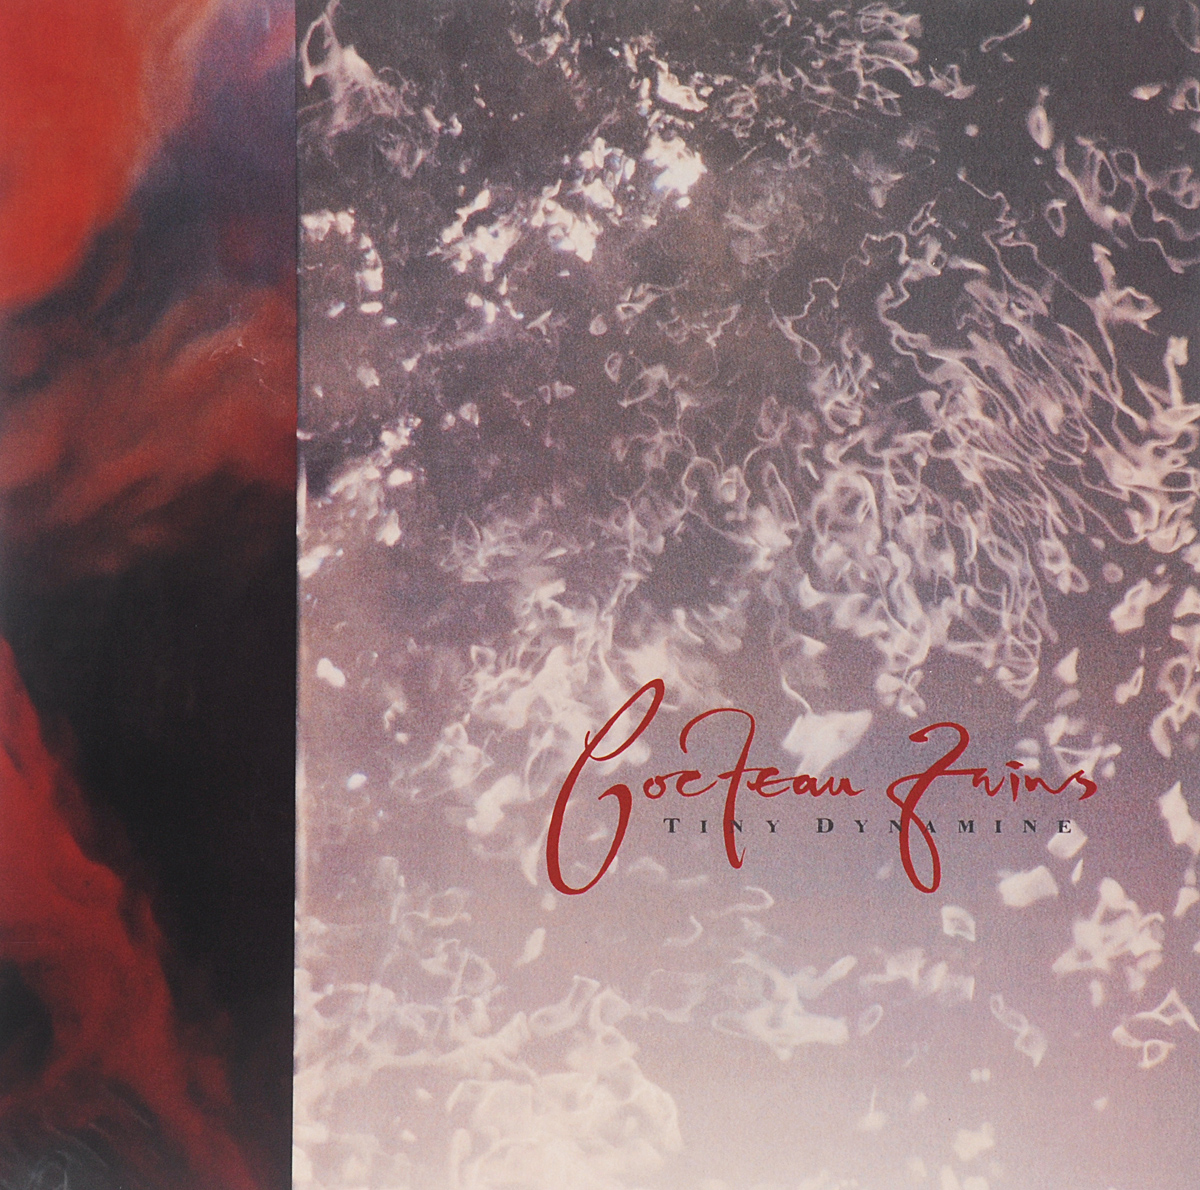 купить Cocteau Twins Cocteau Twins. Tiny Dynamine / Echoes In A Shallow Bay (LP) дешево